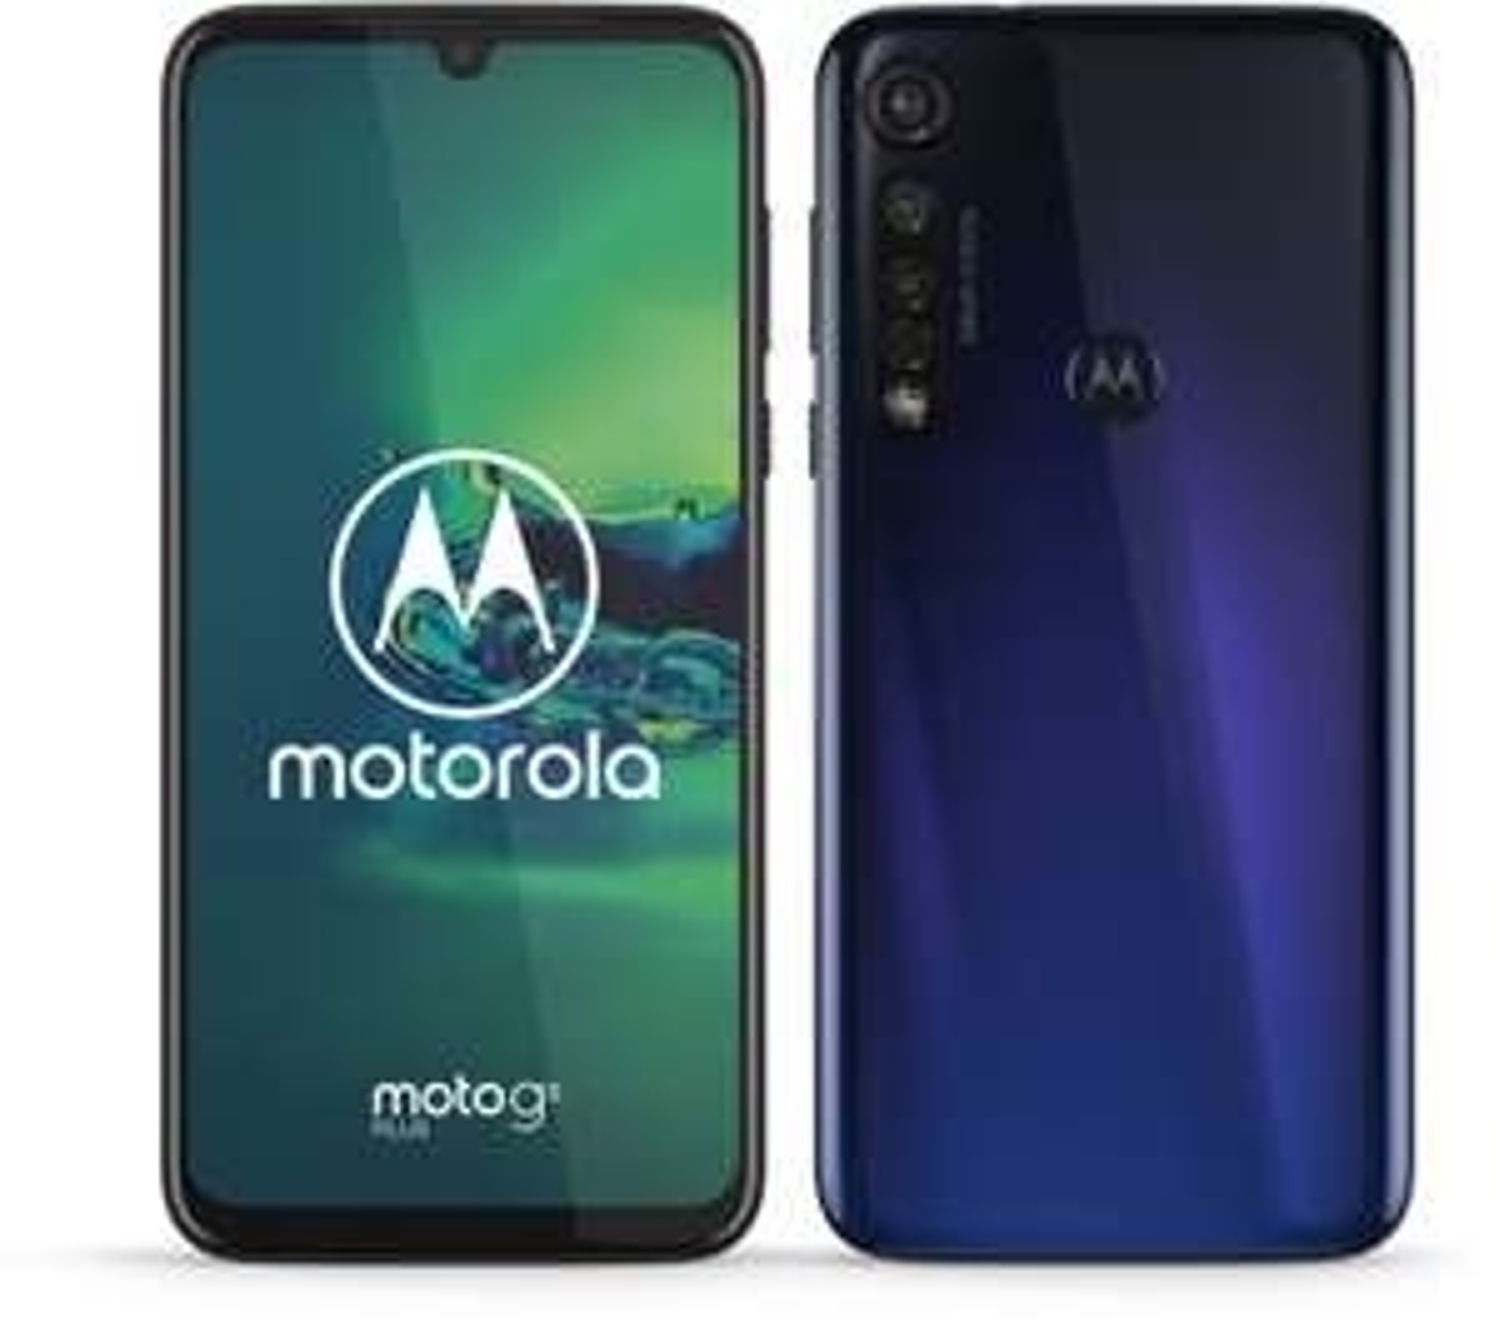 "Motorola Moto G8 Plus - 6.3"" Dual SIM Smartphone (64GB / 4GB RAM, USB-C, NFC, IP52, 4000mAh, Android 9) für 199€ bzw 179,10€ mit Saturn Card"